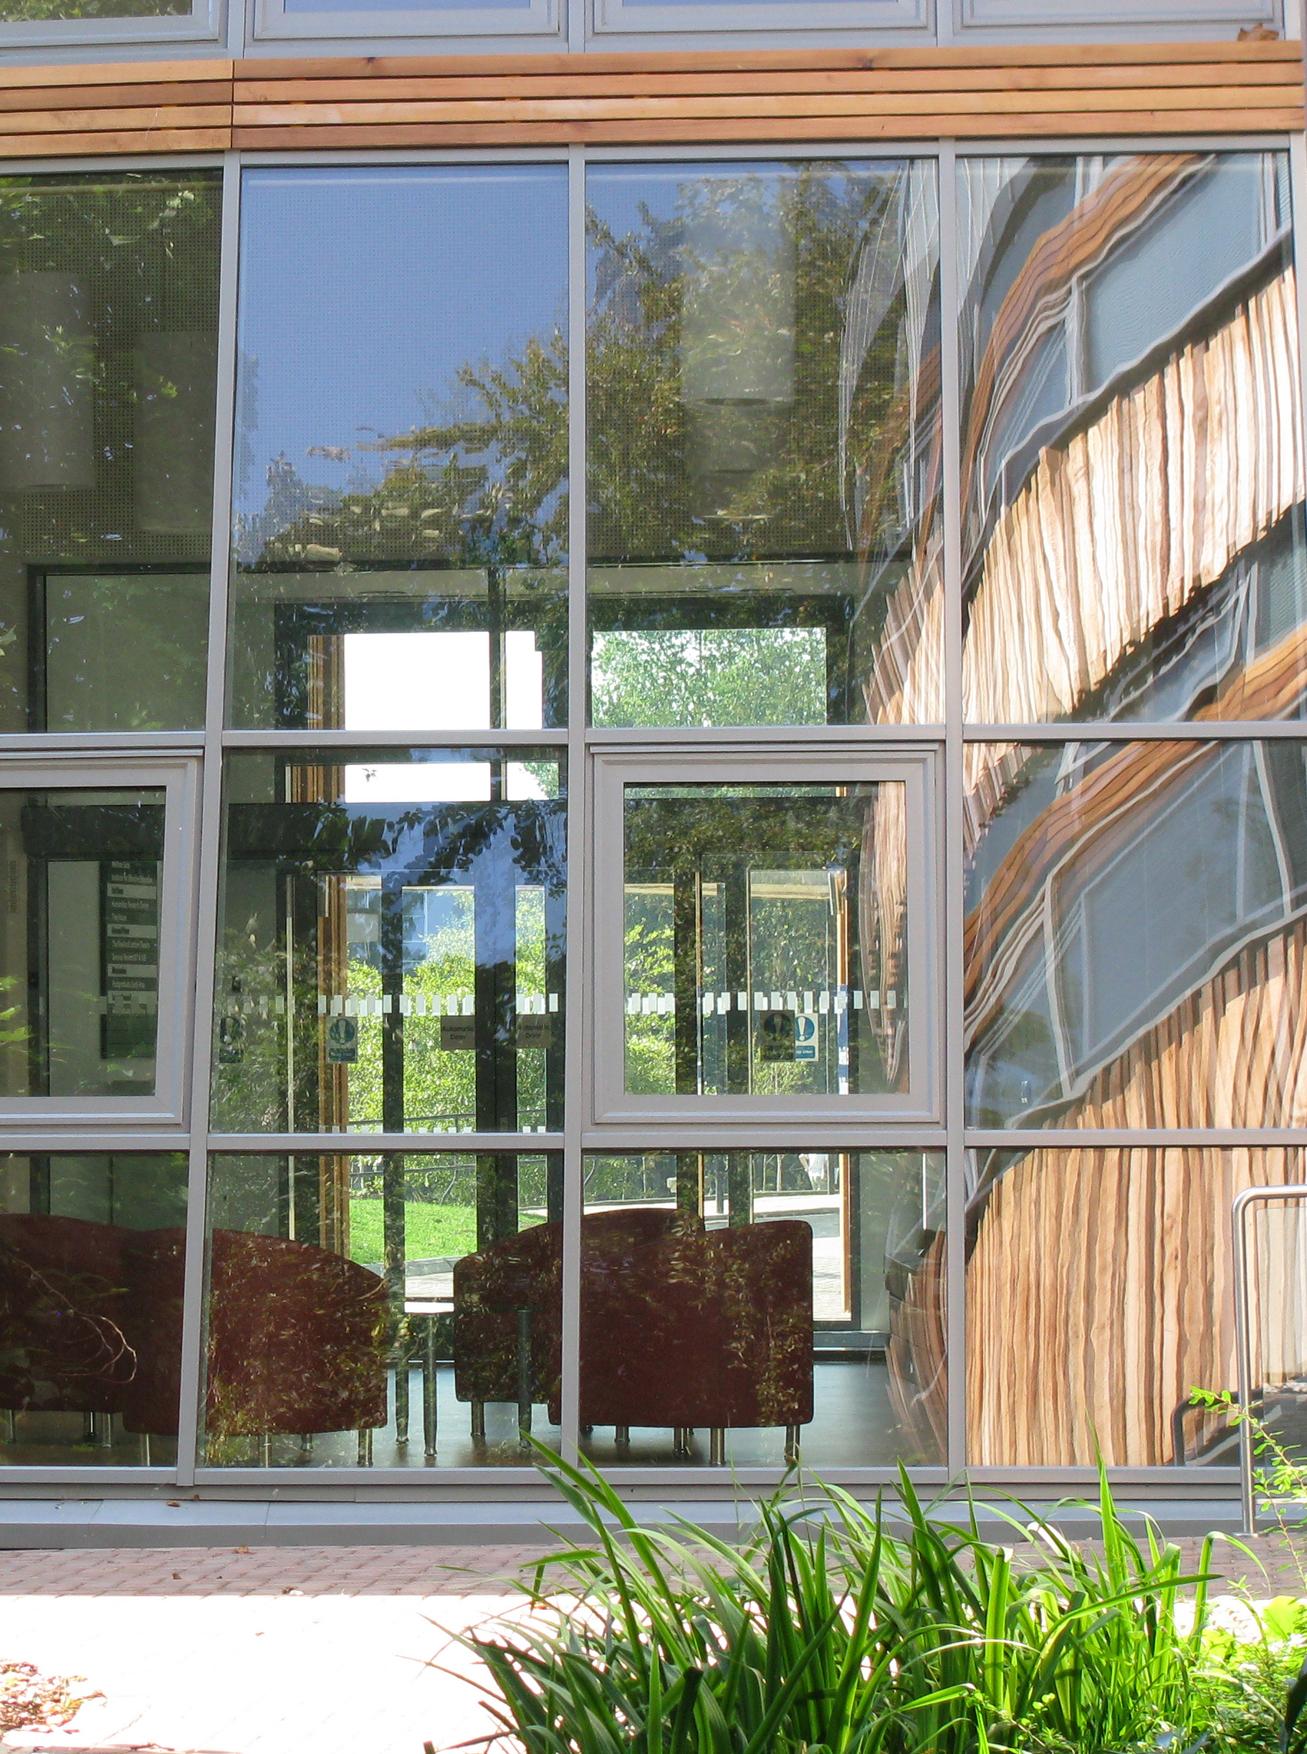 Stephen-Hill-Architects-Berrick-Saul-Building-York-06